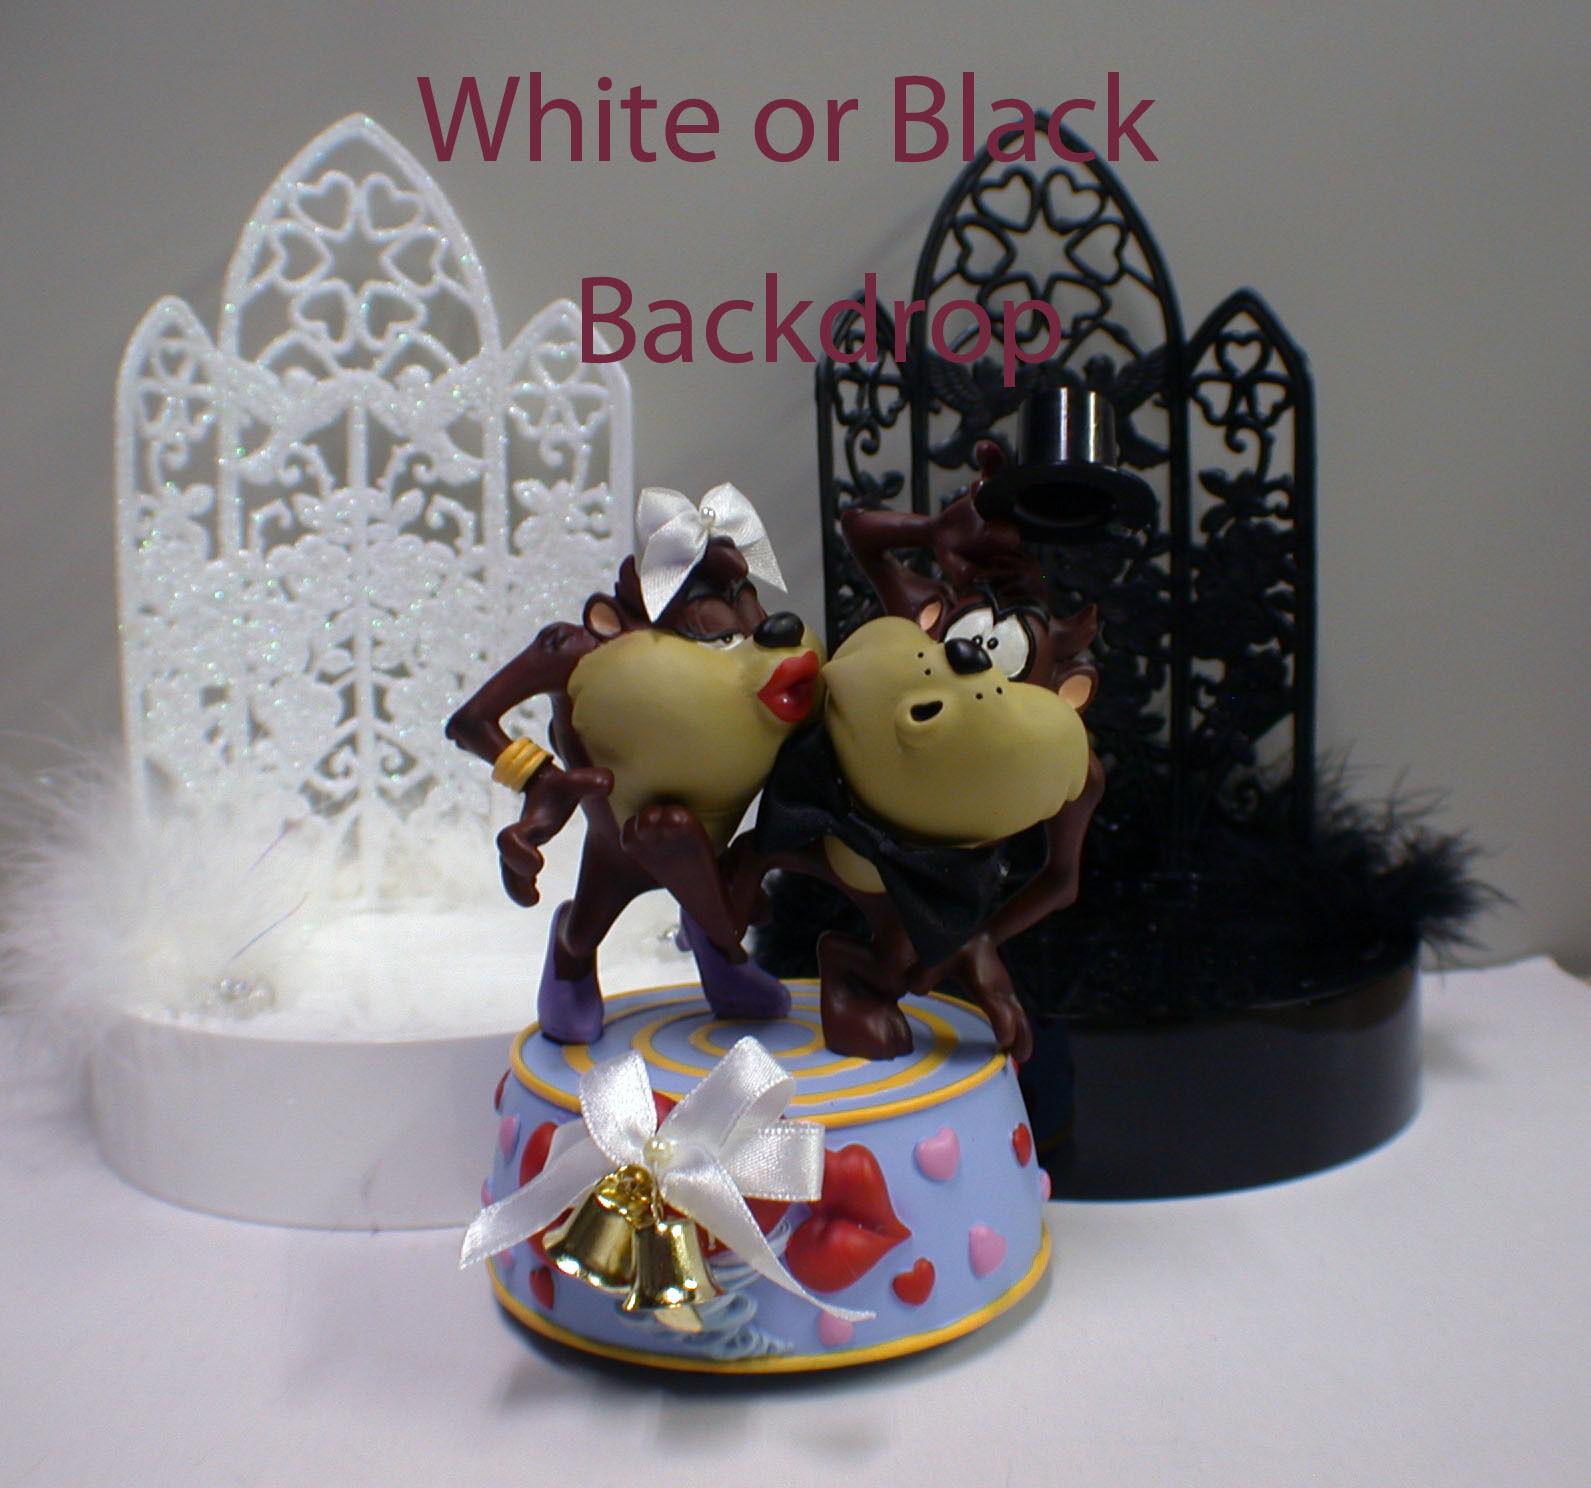 Diable de Tasmanie TAZ wedding cake topper GROOM TOP Noir Ou Blanc Toile de fond Looney